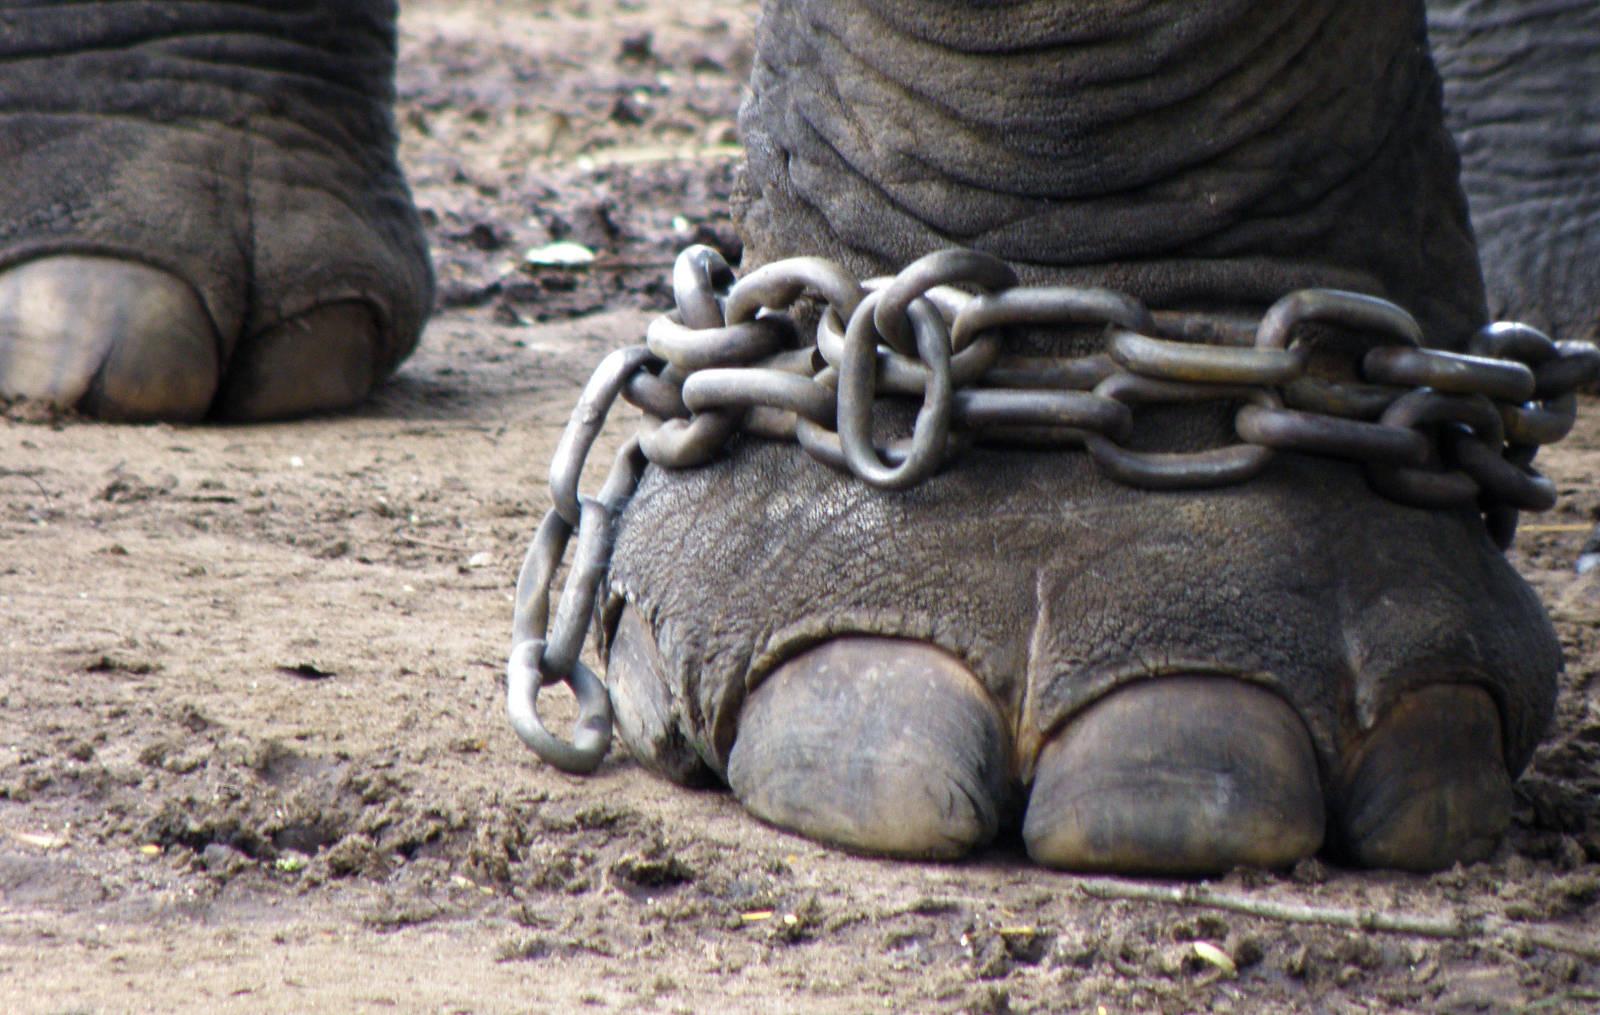 zoos animal prisons or animal sanctuaries essay